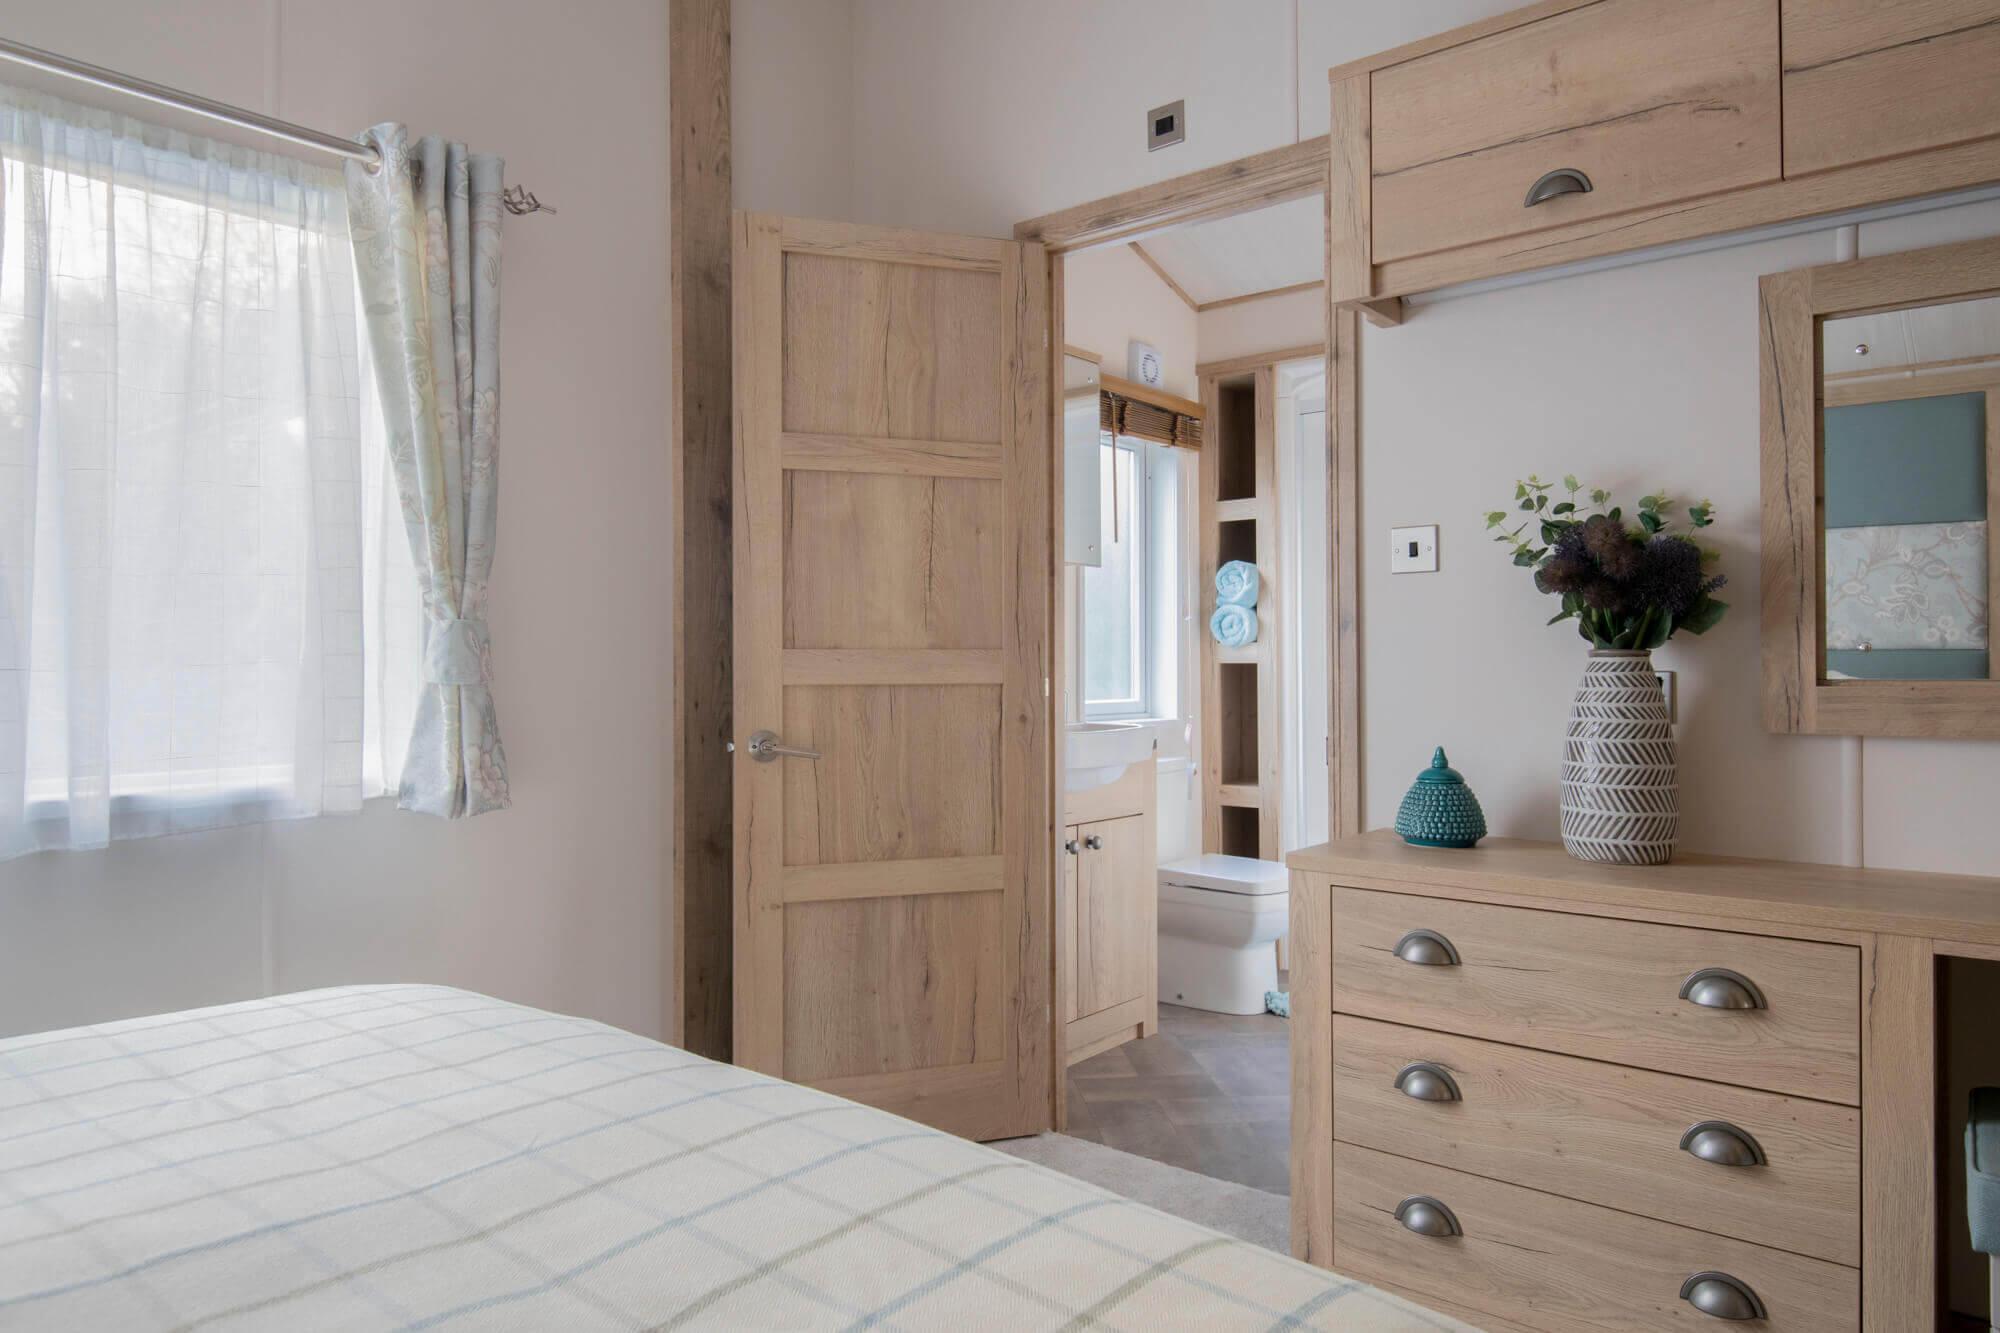 ABI Harrogate master bedroom with ensuite bathroom